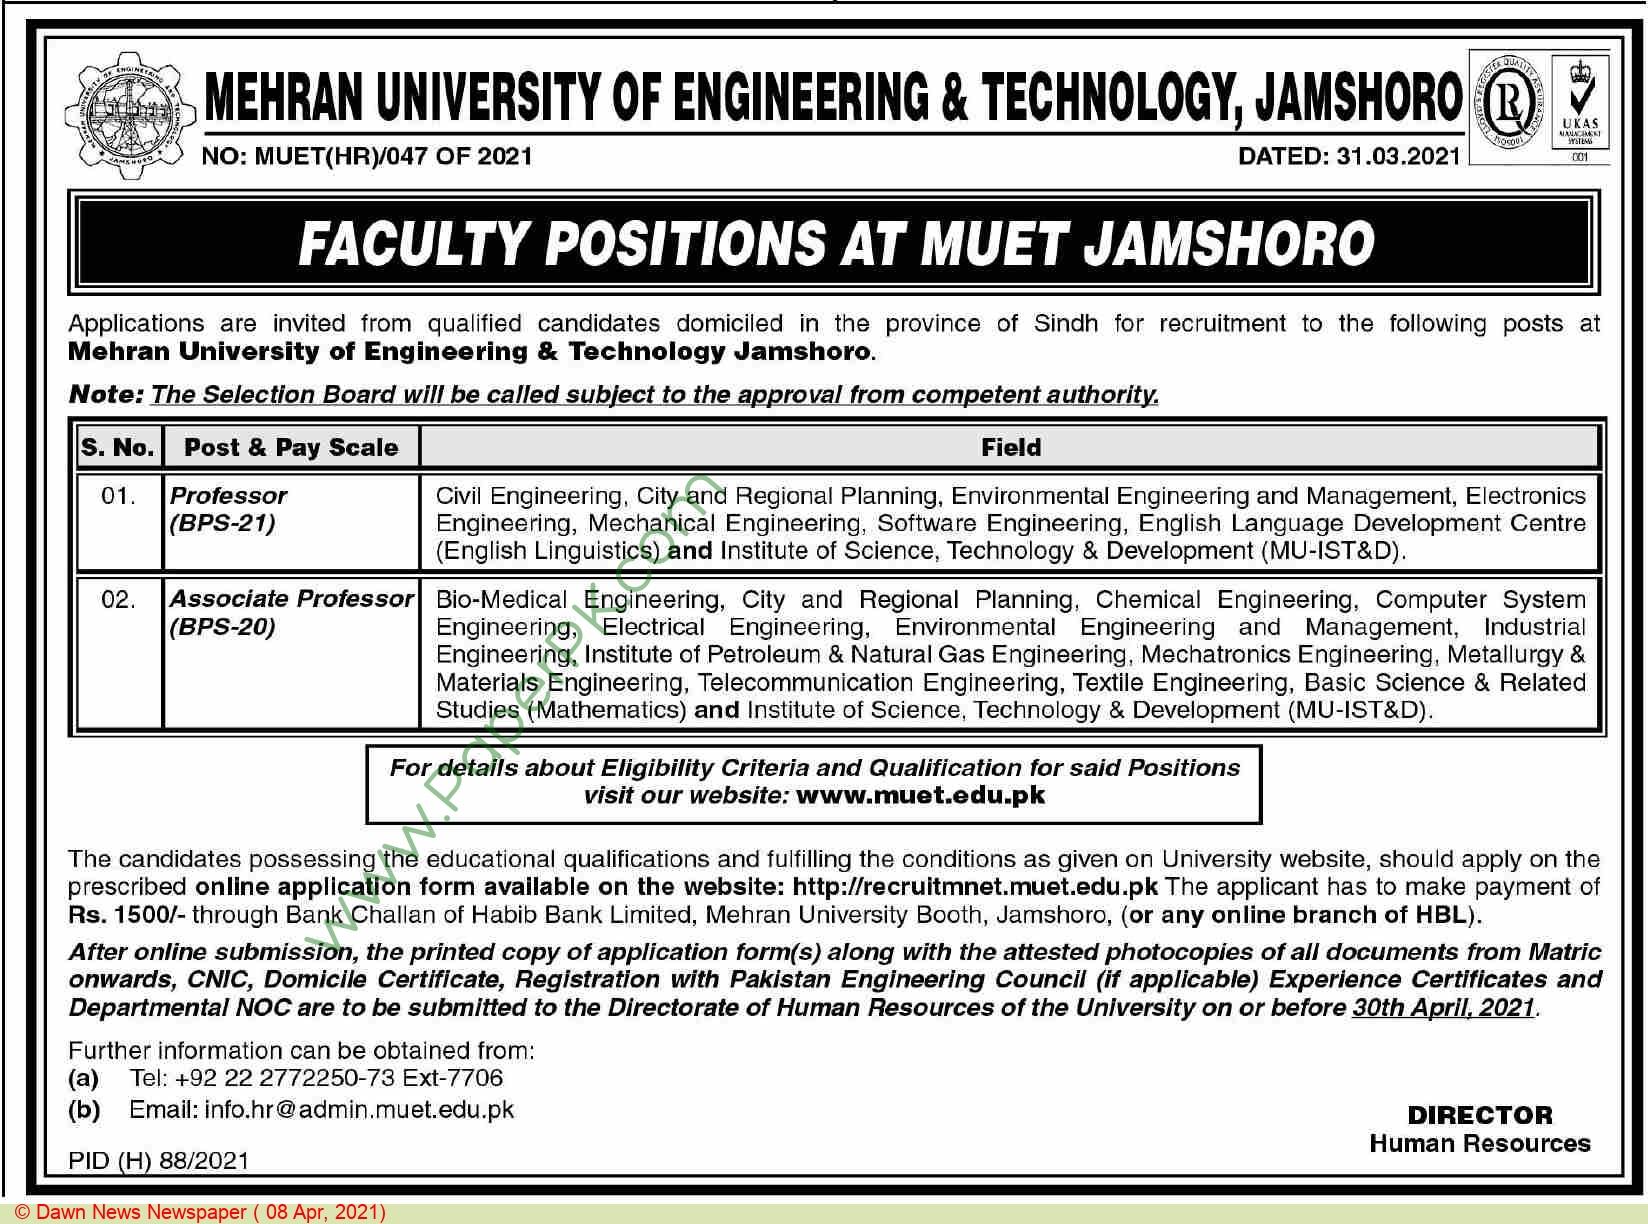 Mehran University Of Engineering & Technology jobs newspaper ad for Professor in Jamshoro on 2021-04-08